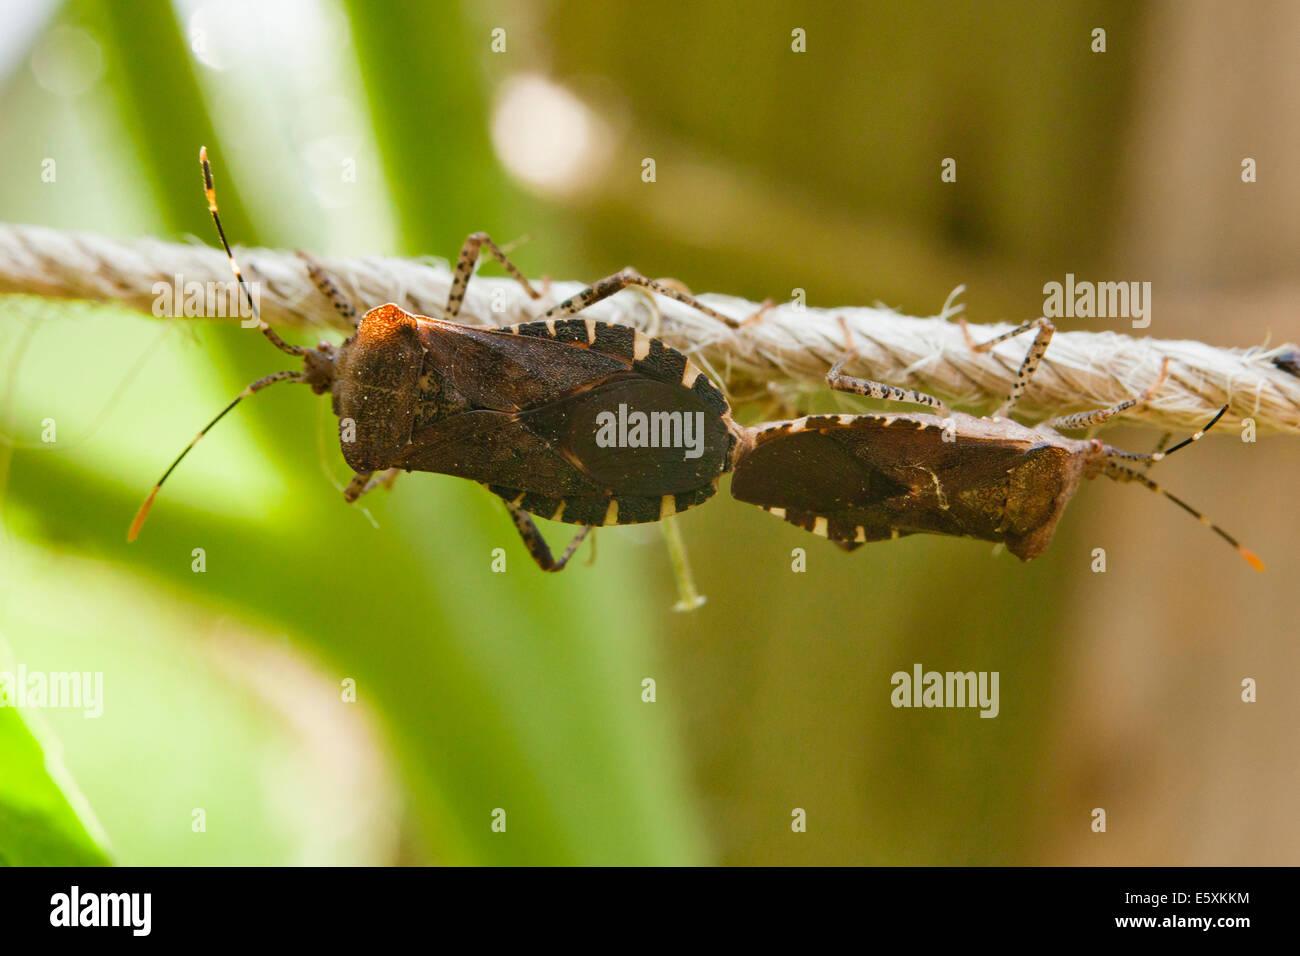 Squash bugs mating (Anasa tristis) - USA - Stock Image